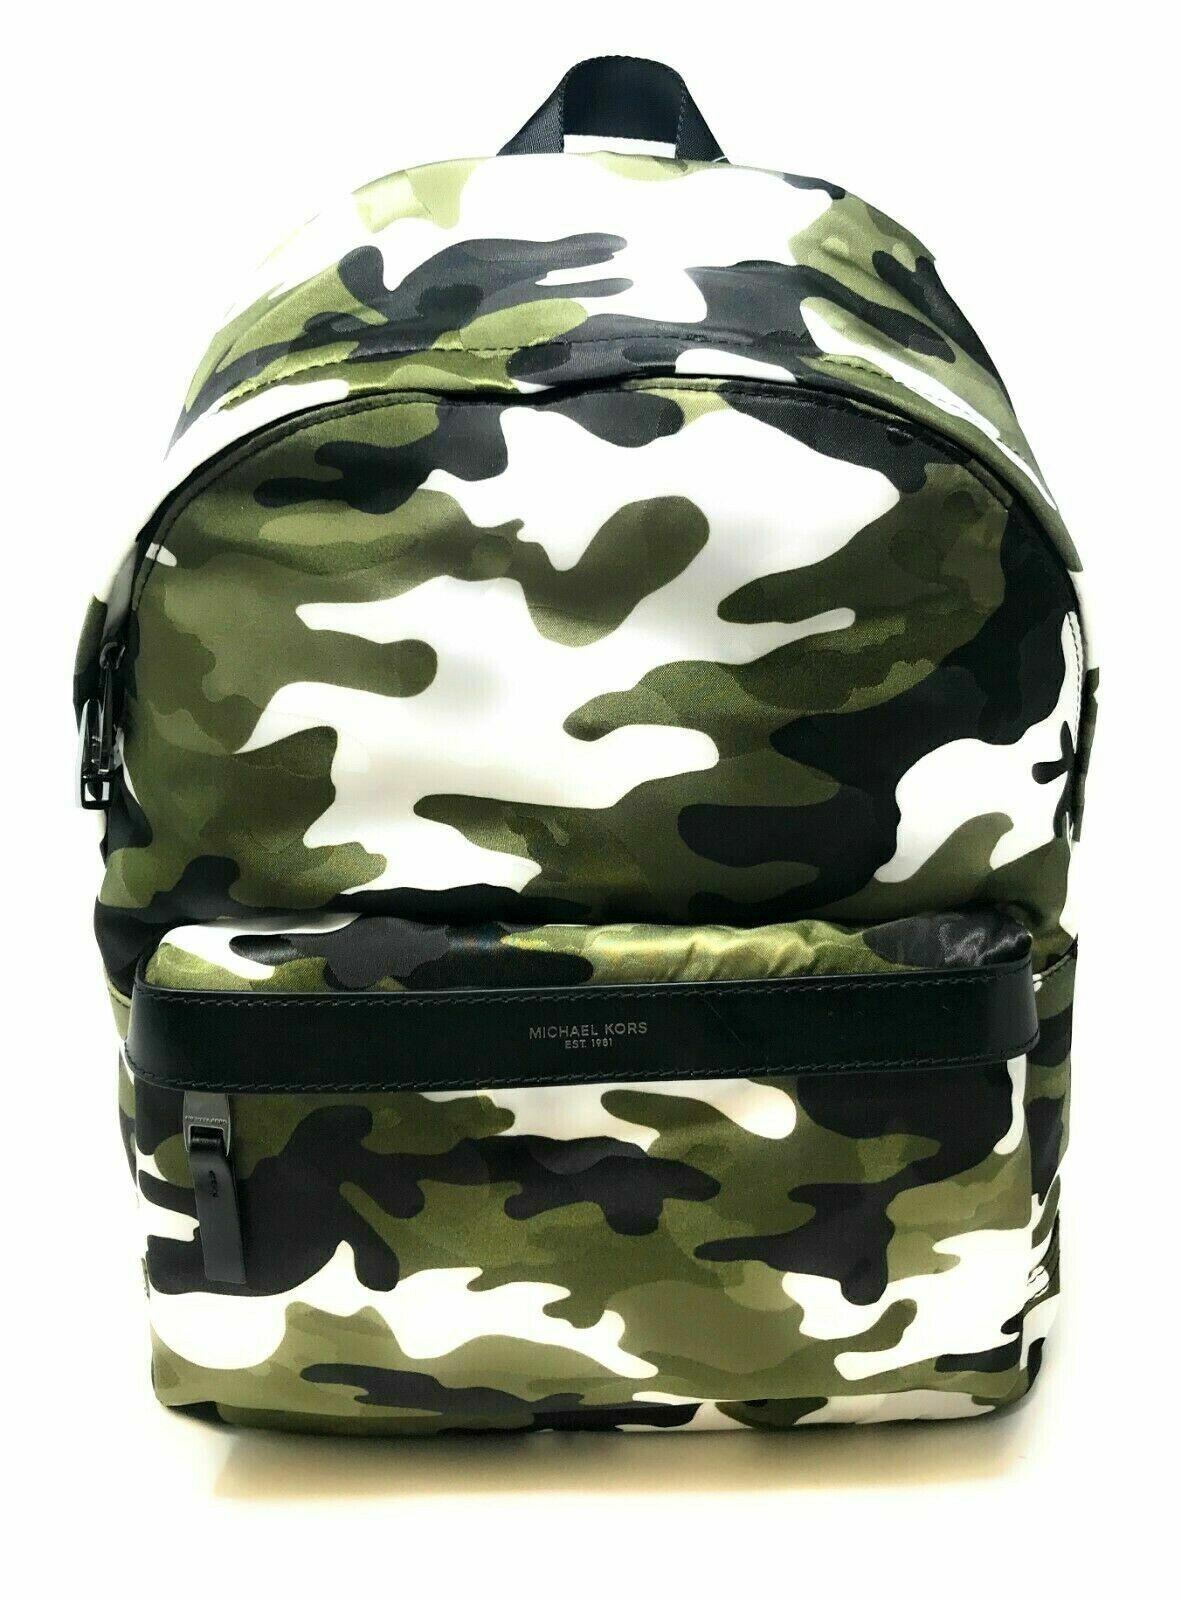 Michael Kors Men's Kent Nylon Army Camo Tech Backpack (Select Color) Bags